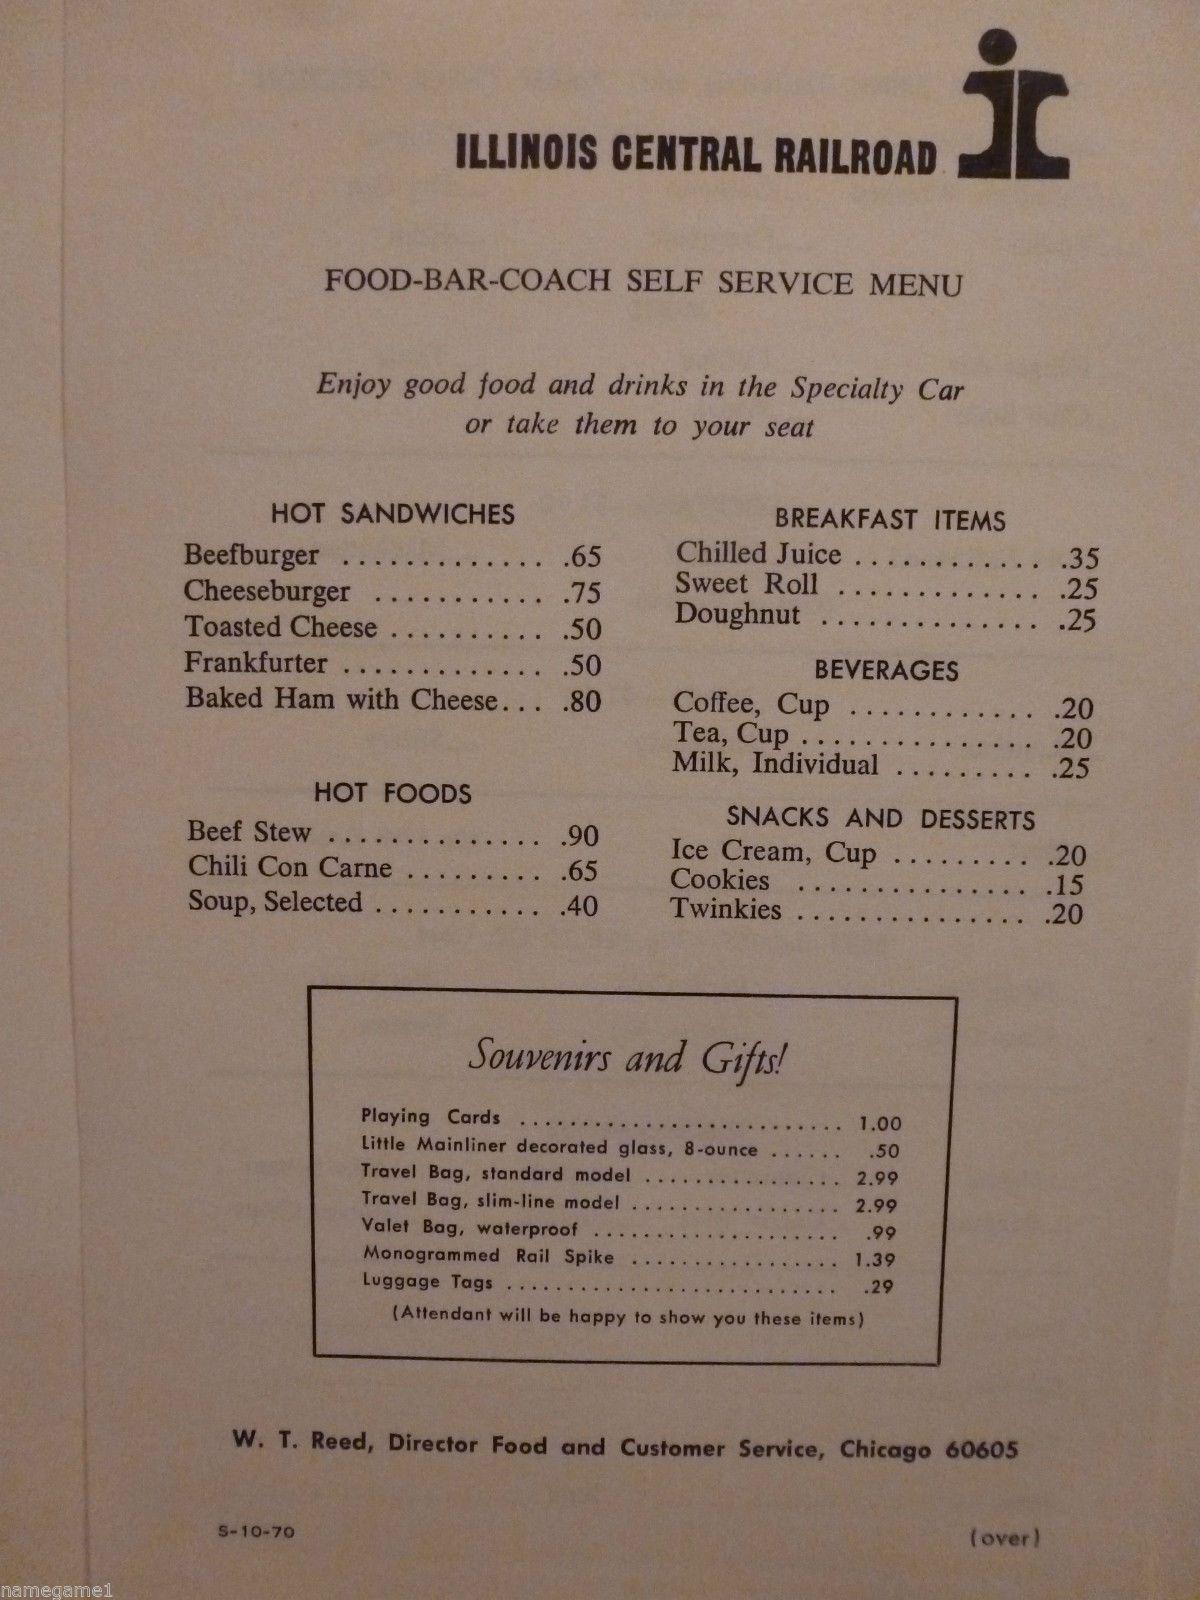 Railroad Menu Illinois Central Food Bar Coach Self Serve 1970 Central Food Bars Recipes Illinois